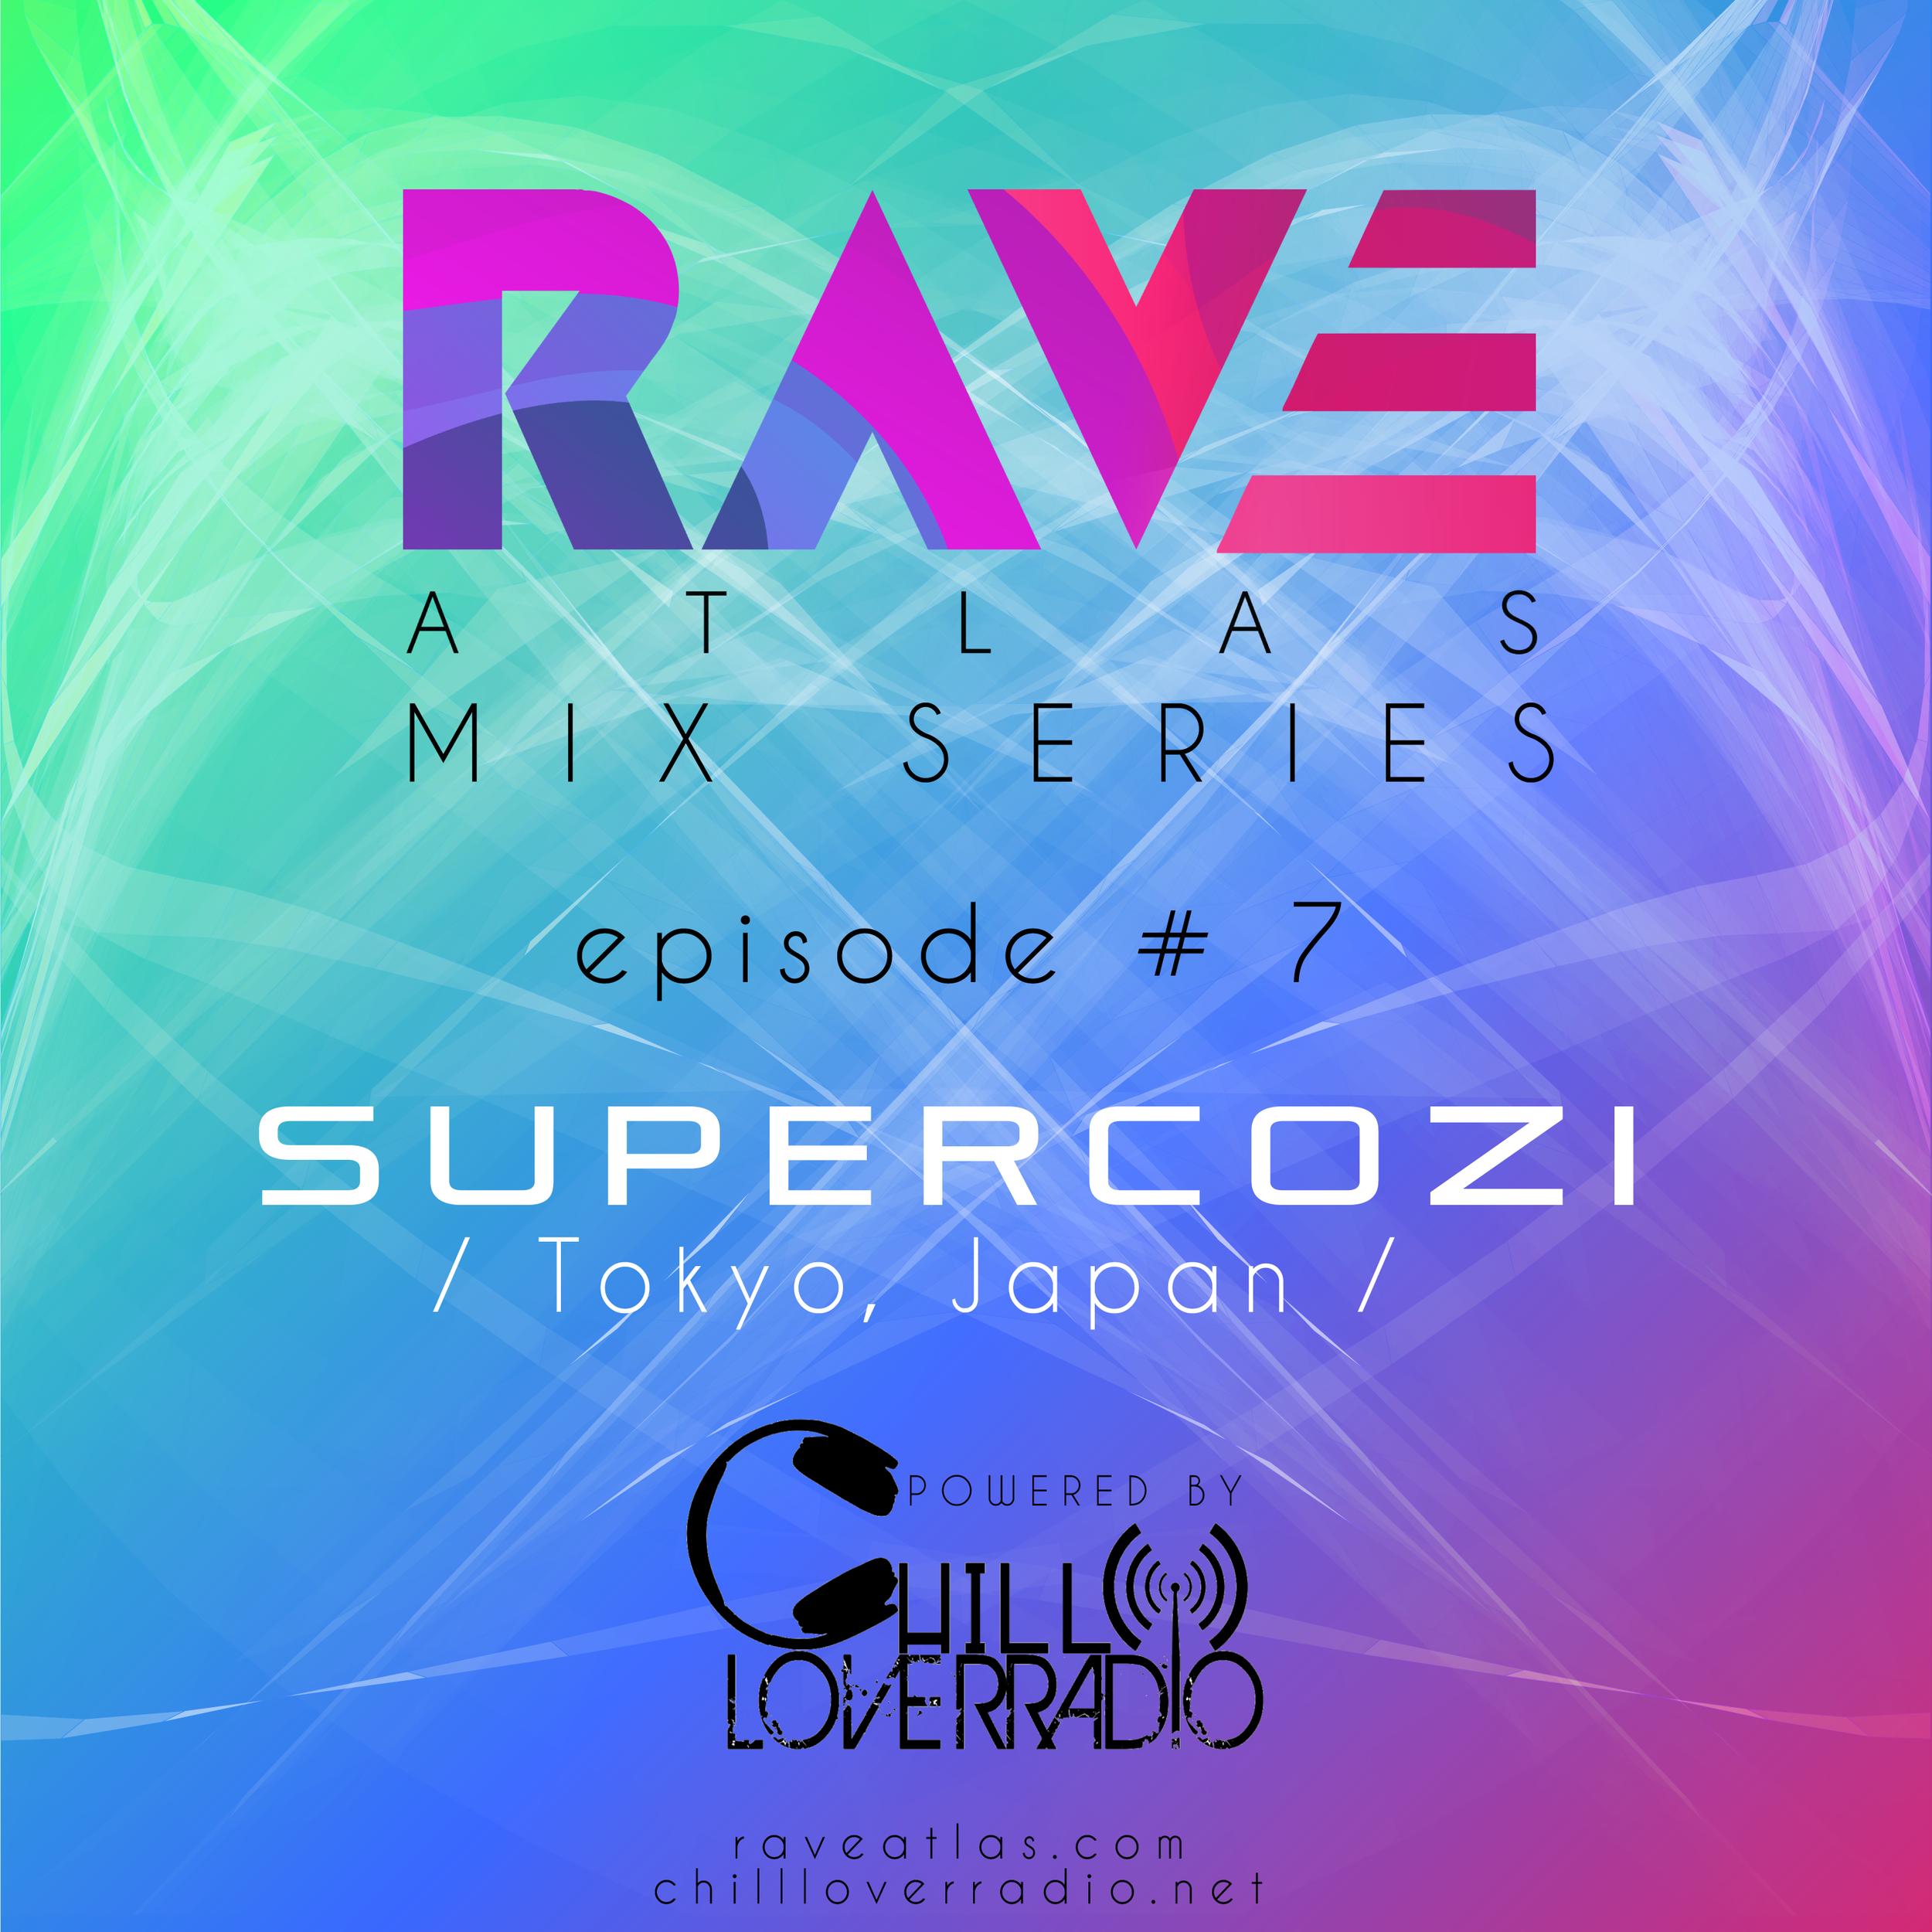 RAVE ATLAS MIX SERIES EP 07 - Supercozi - Tokyo, Japan